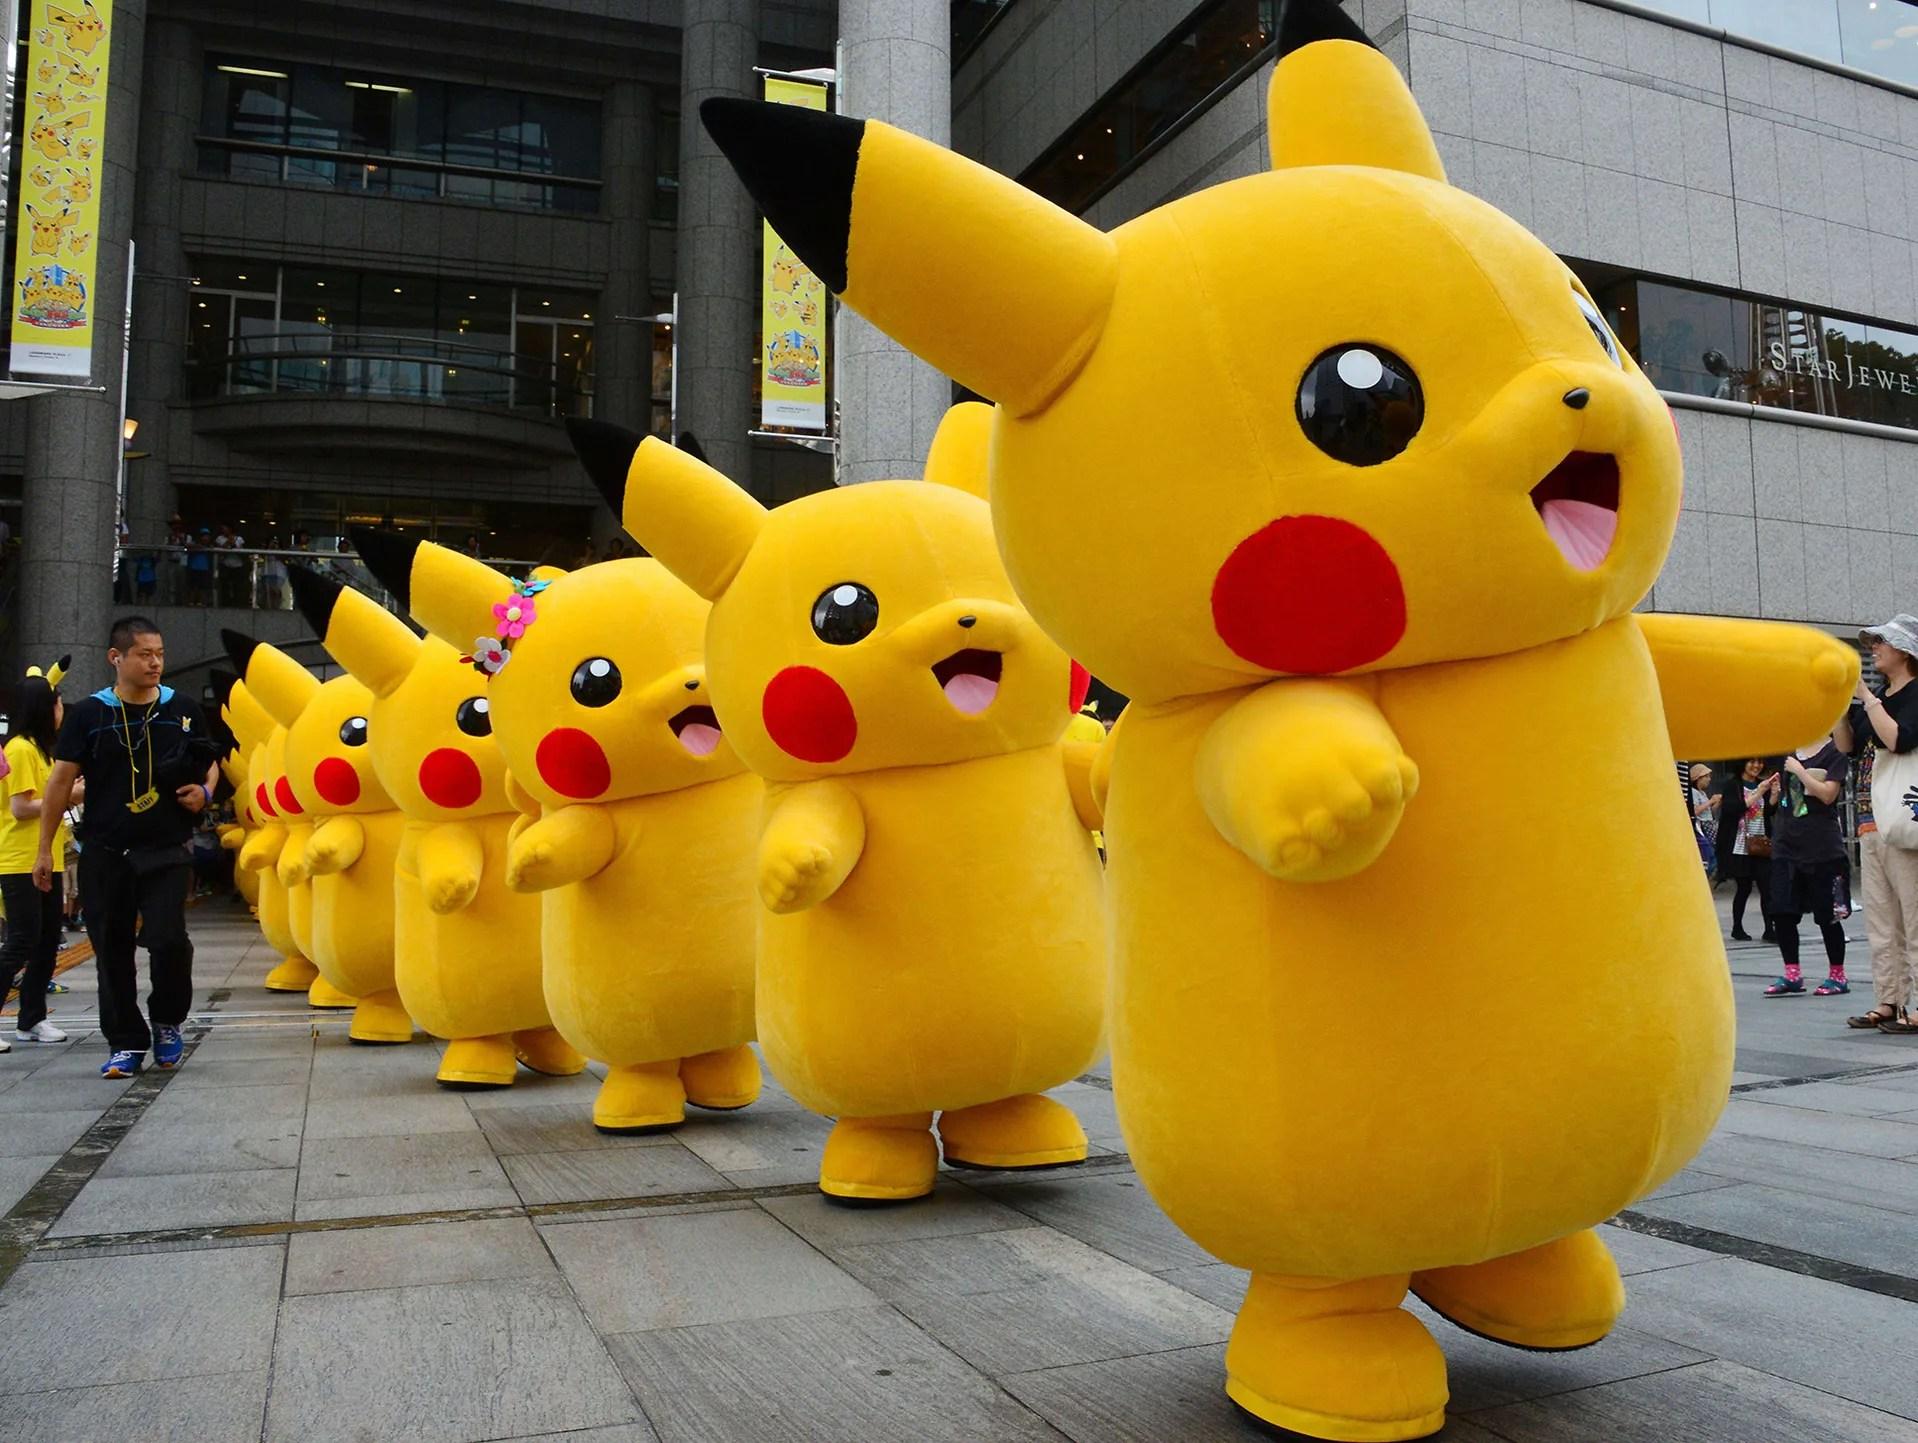 Pikachu characters from the Nintendo video game Pokemon parade at the Landmark Plaza shopping mall on Aug. 14 in Yokohama, Japan.